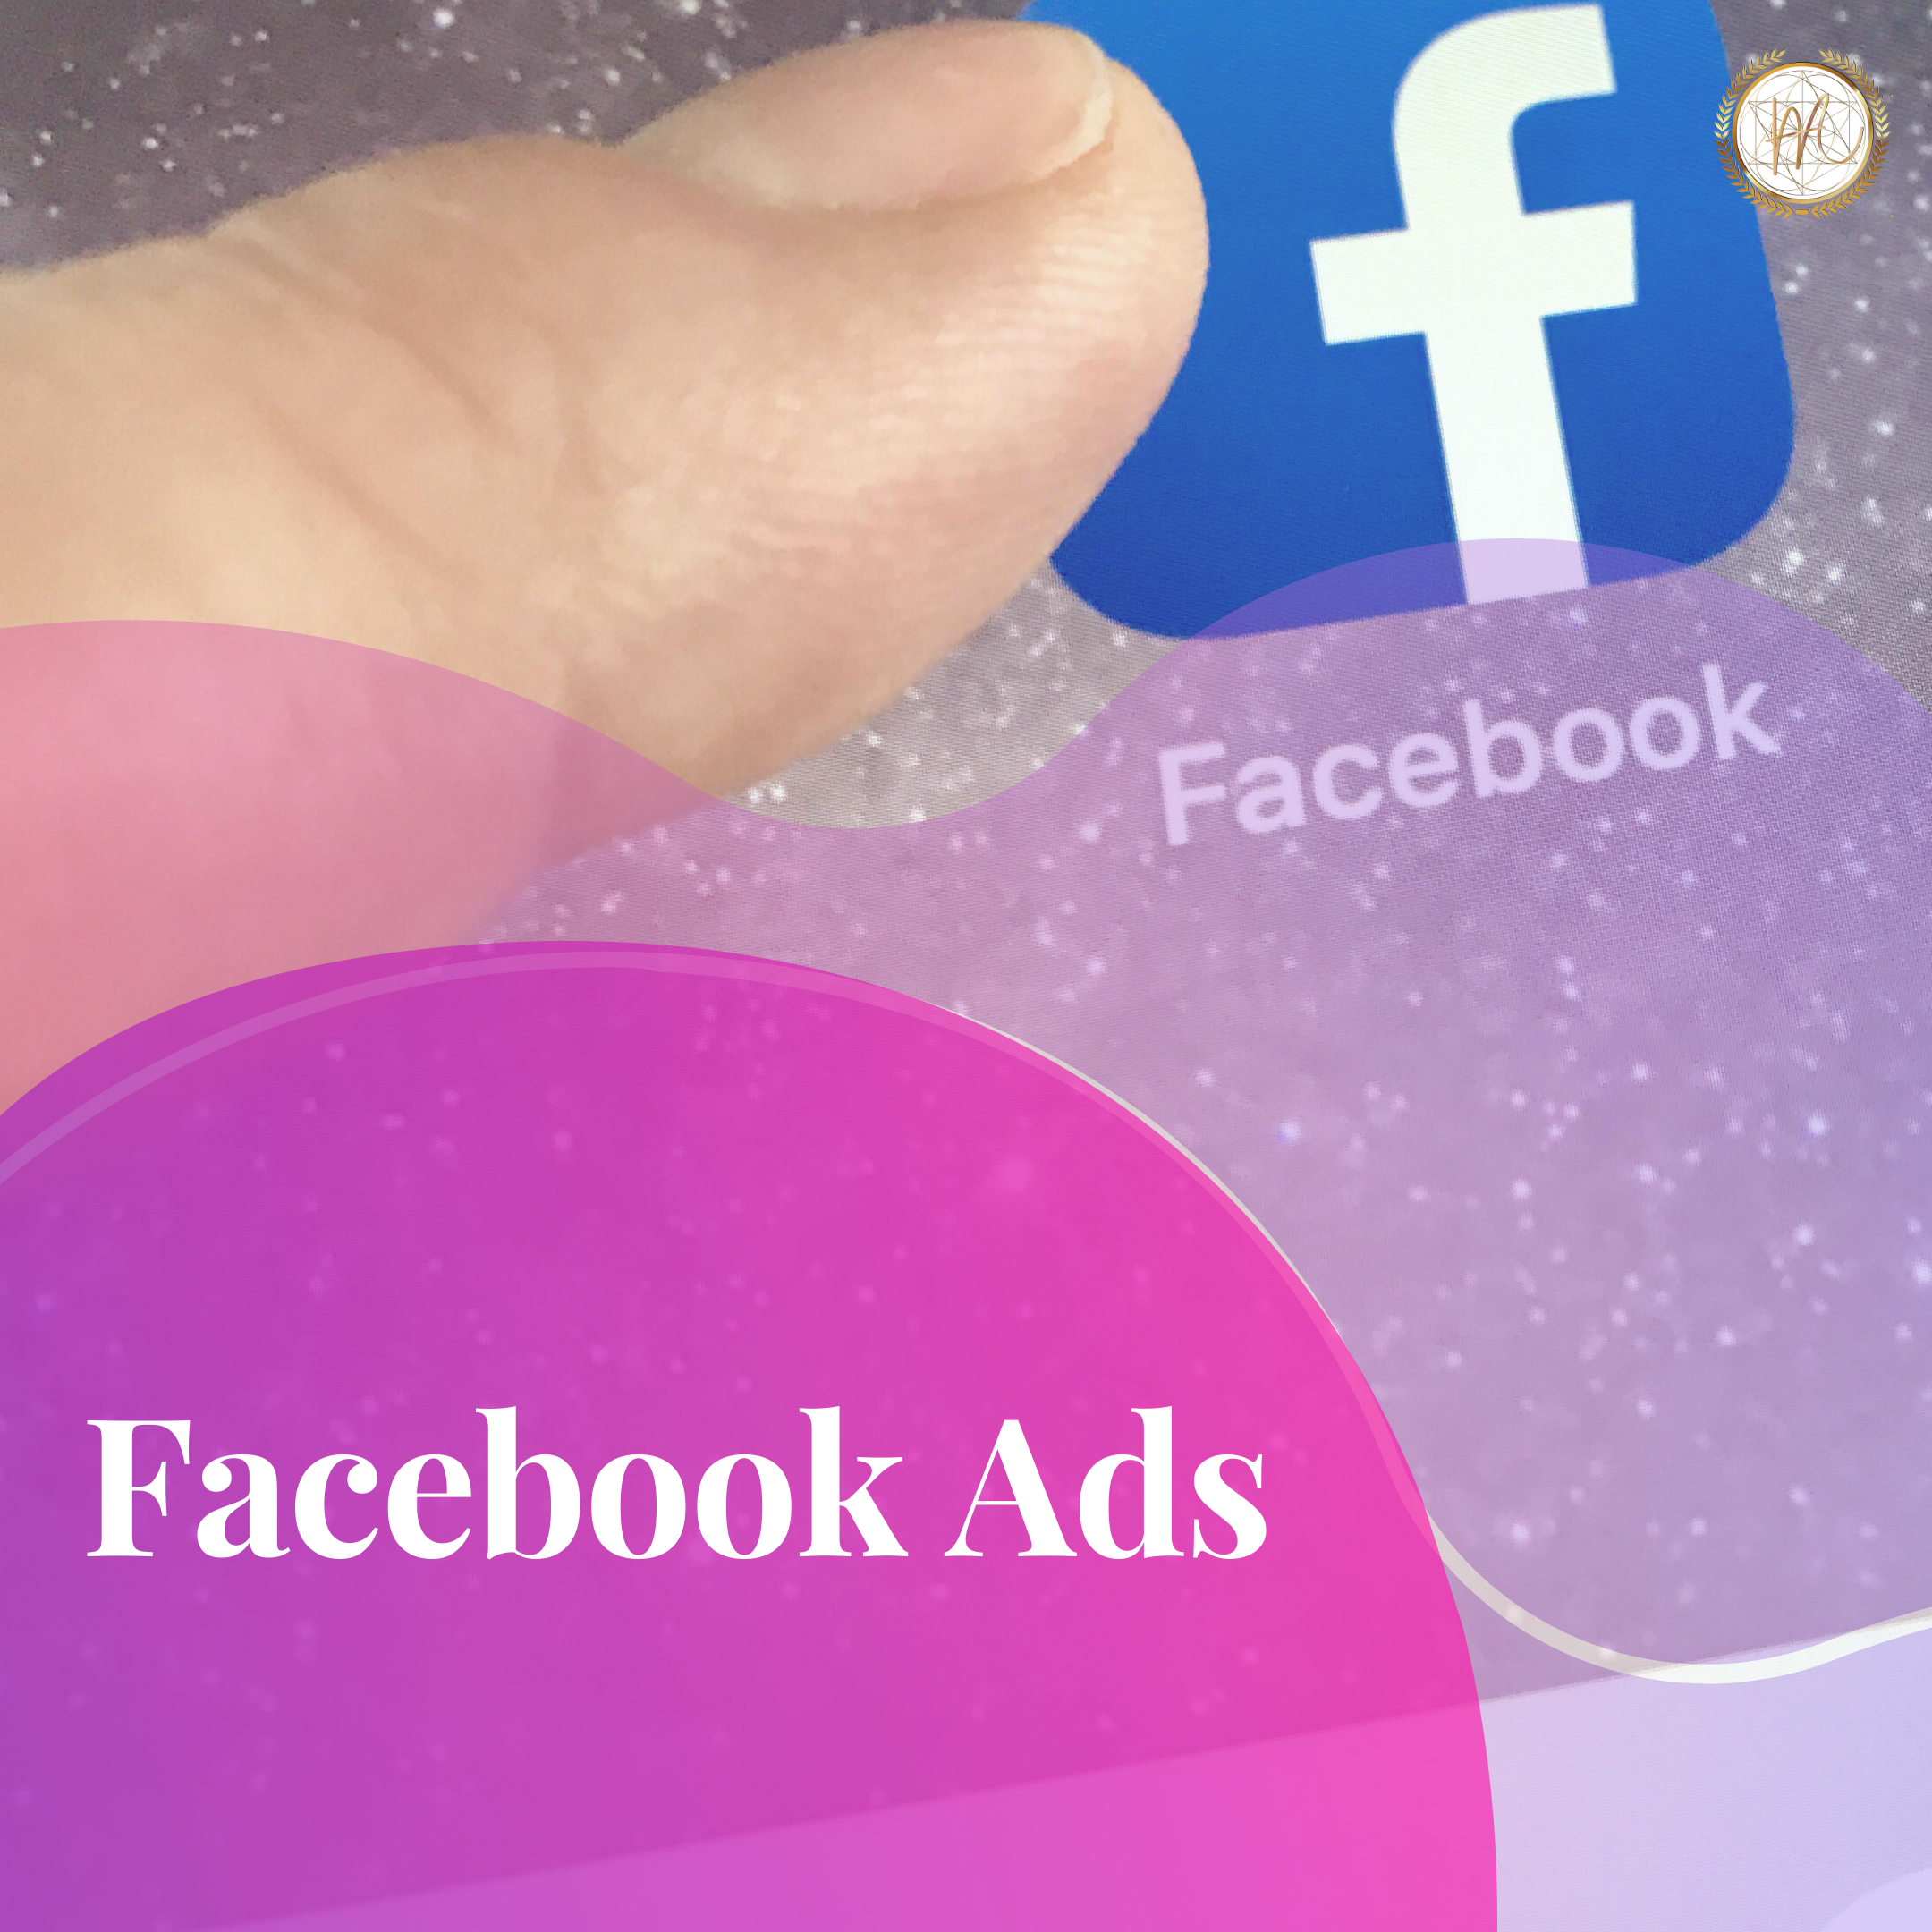 Facebook Ads Management Service - iampowered media - POWERFUL MARKETING